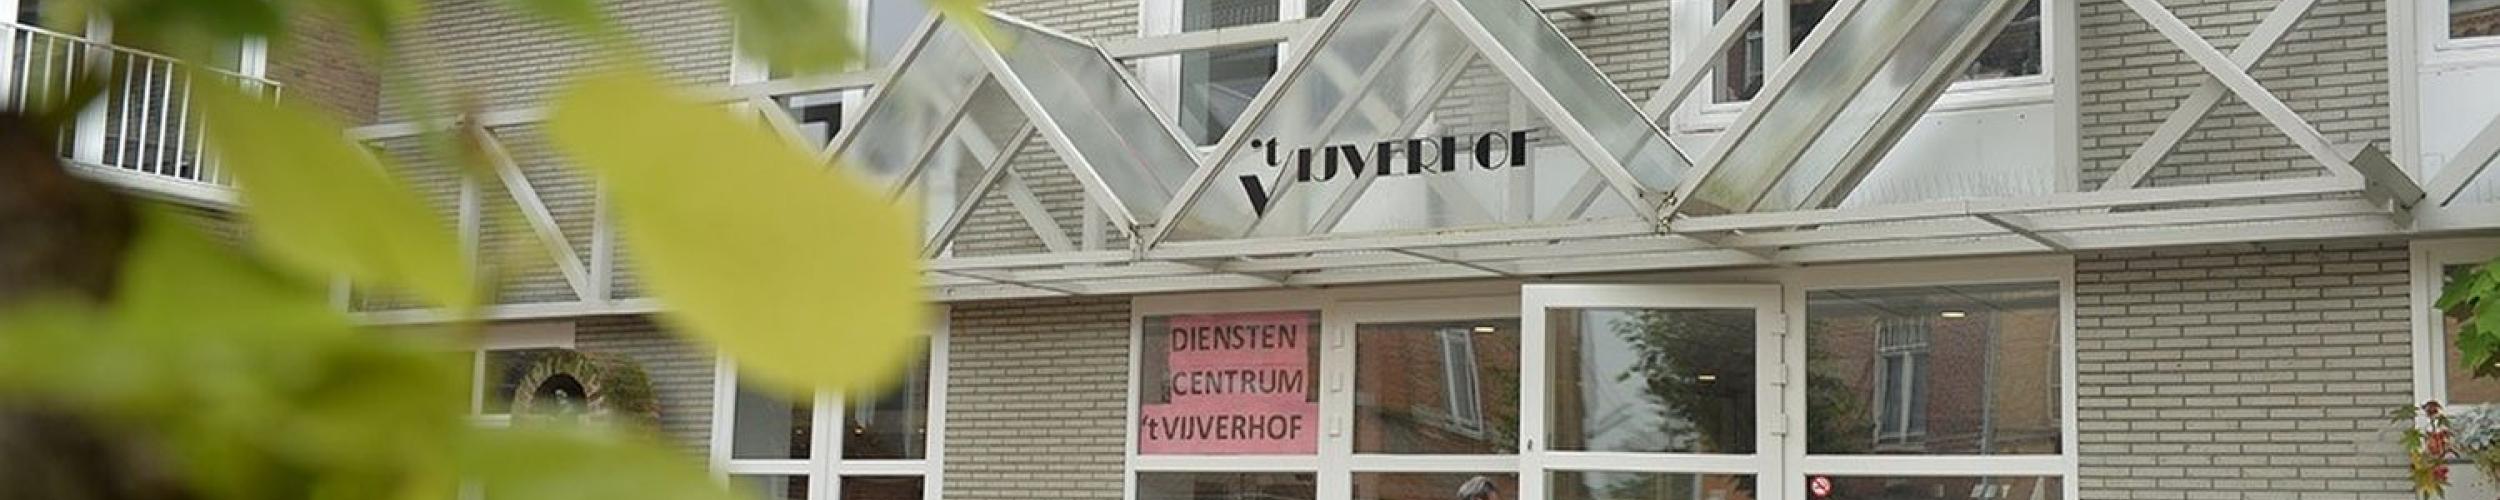 't Vijverhof